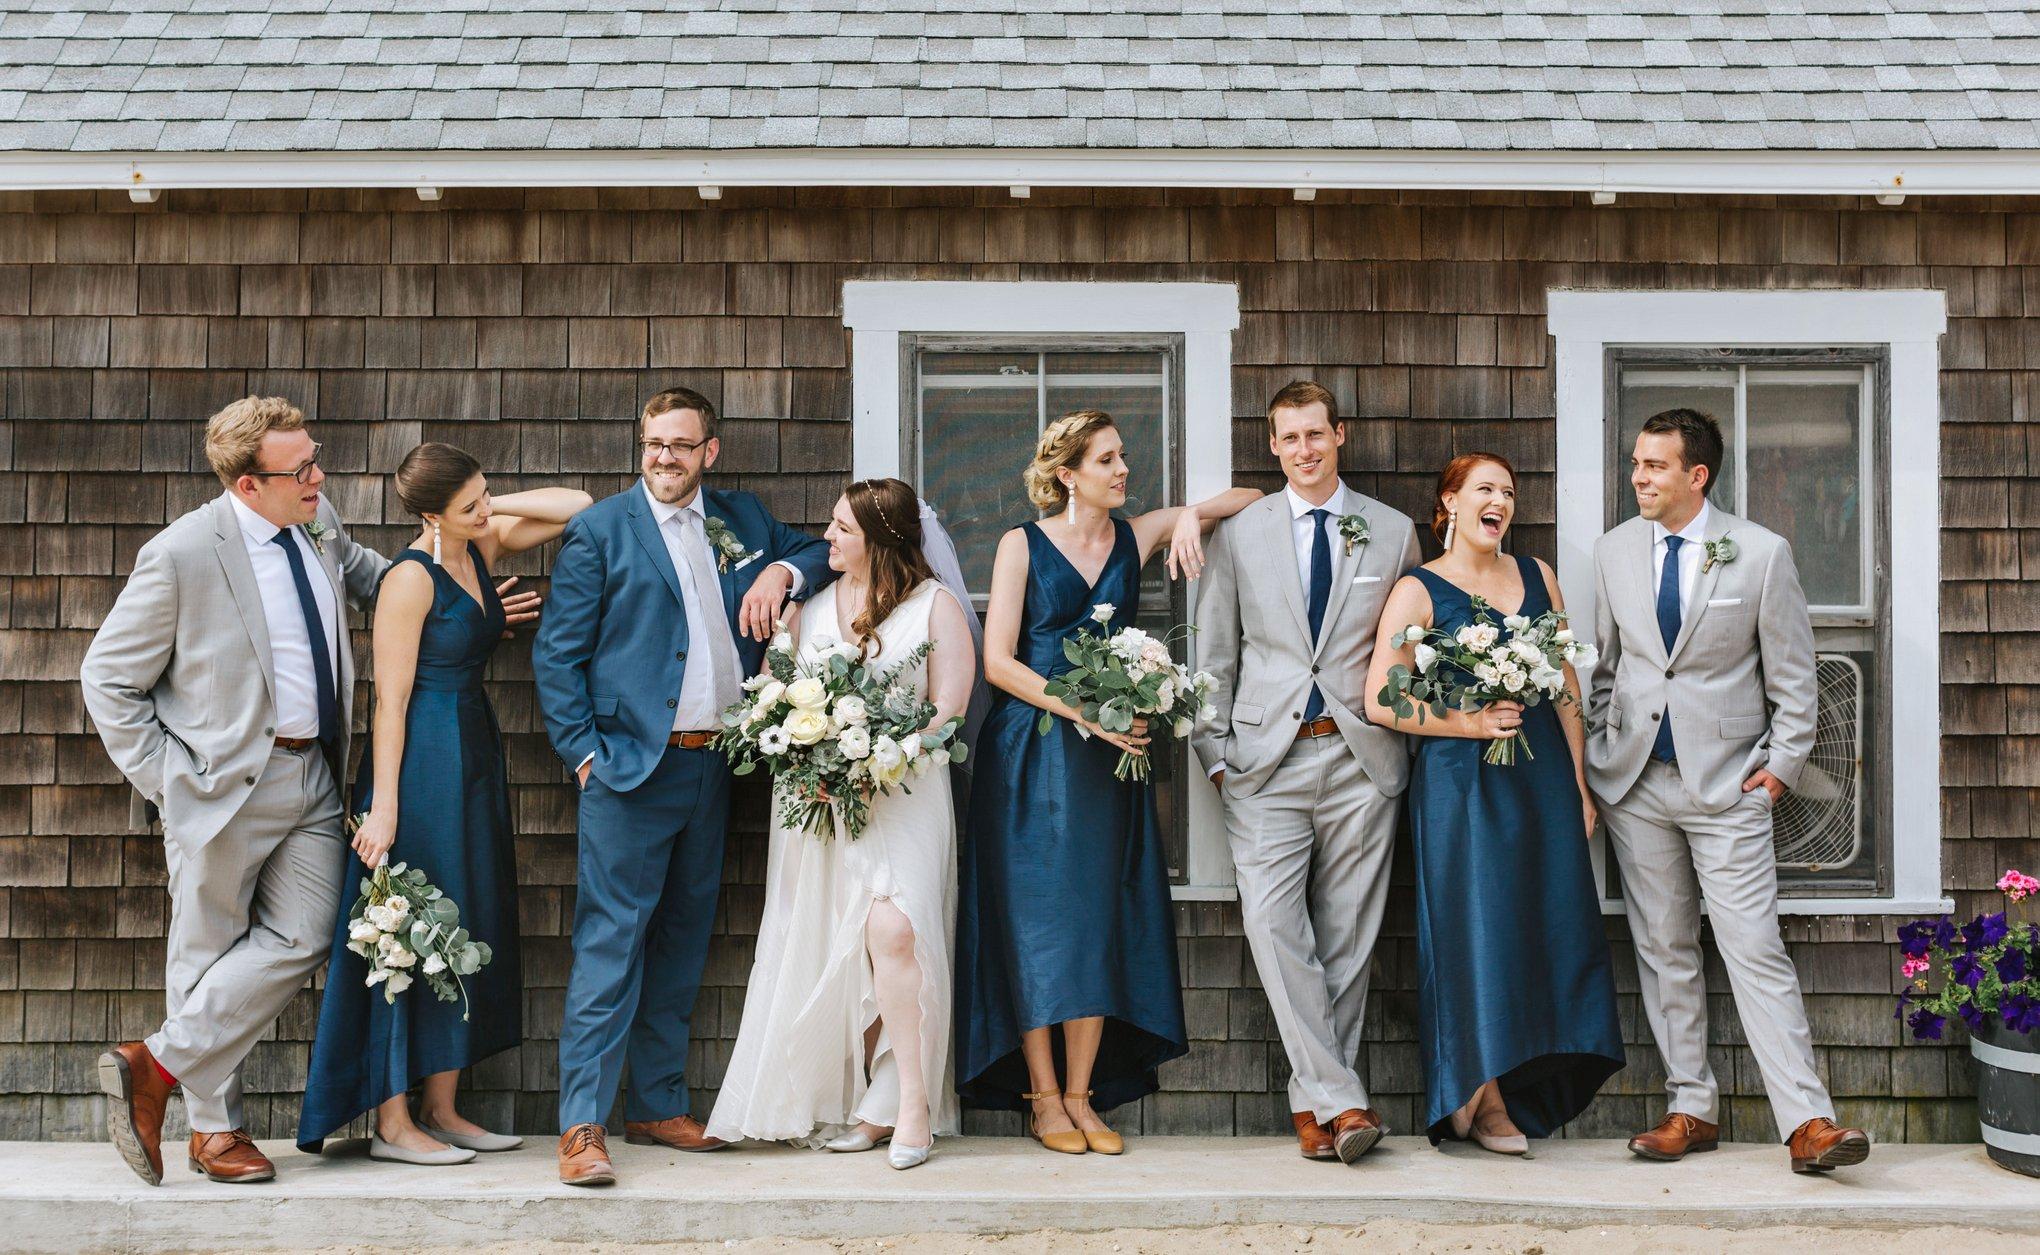 Newport-Wedding-Backyard-Photographer-11.jpg